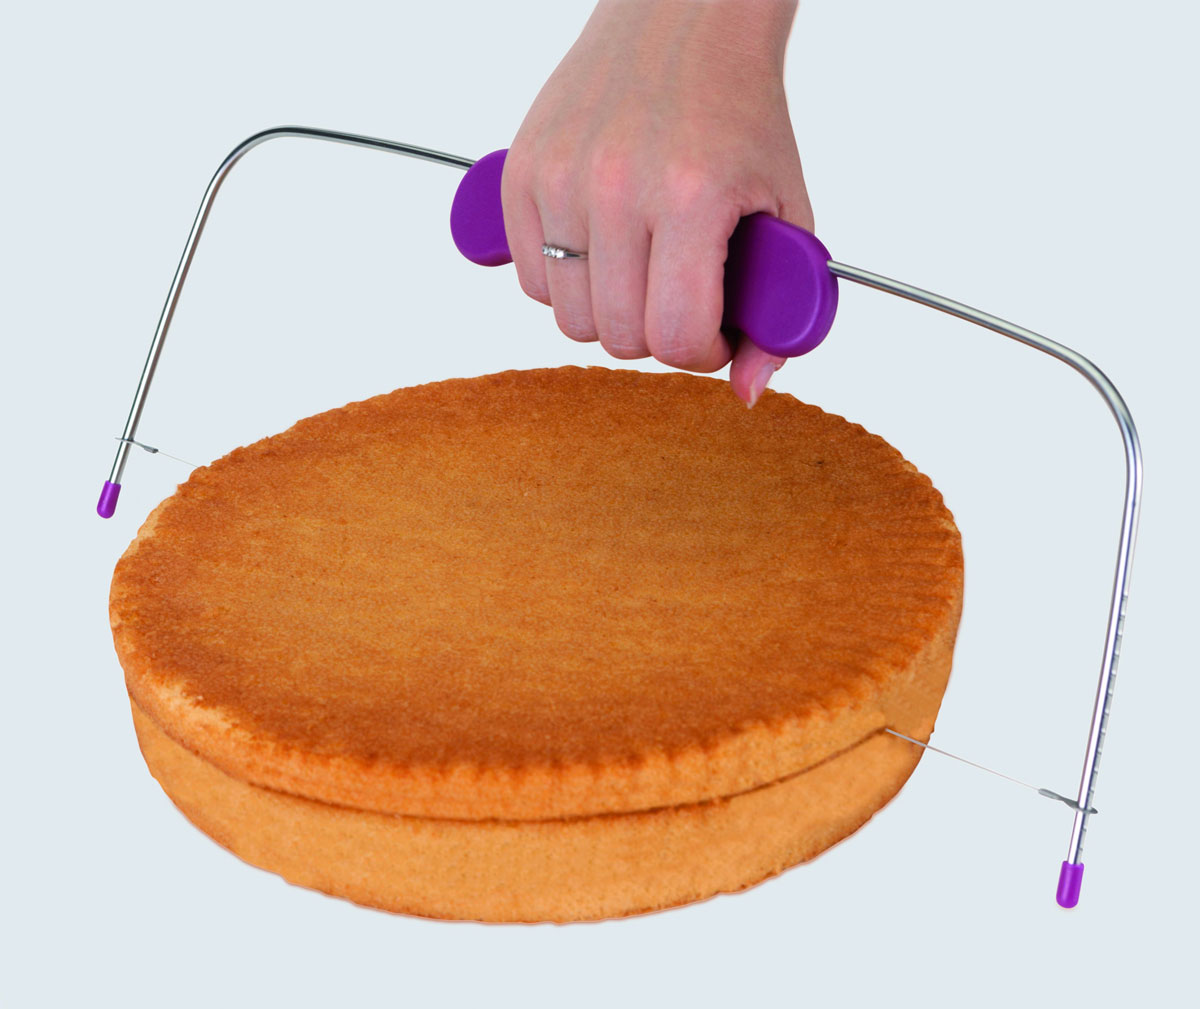 Аппарат для картинки на торт, картинки поздравления пасхой